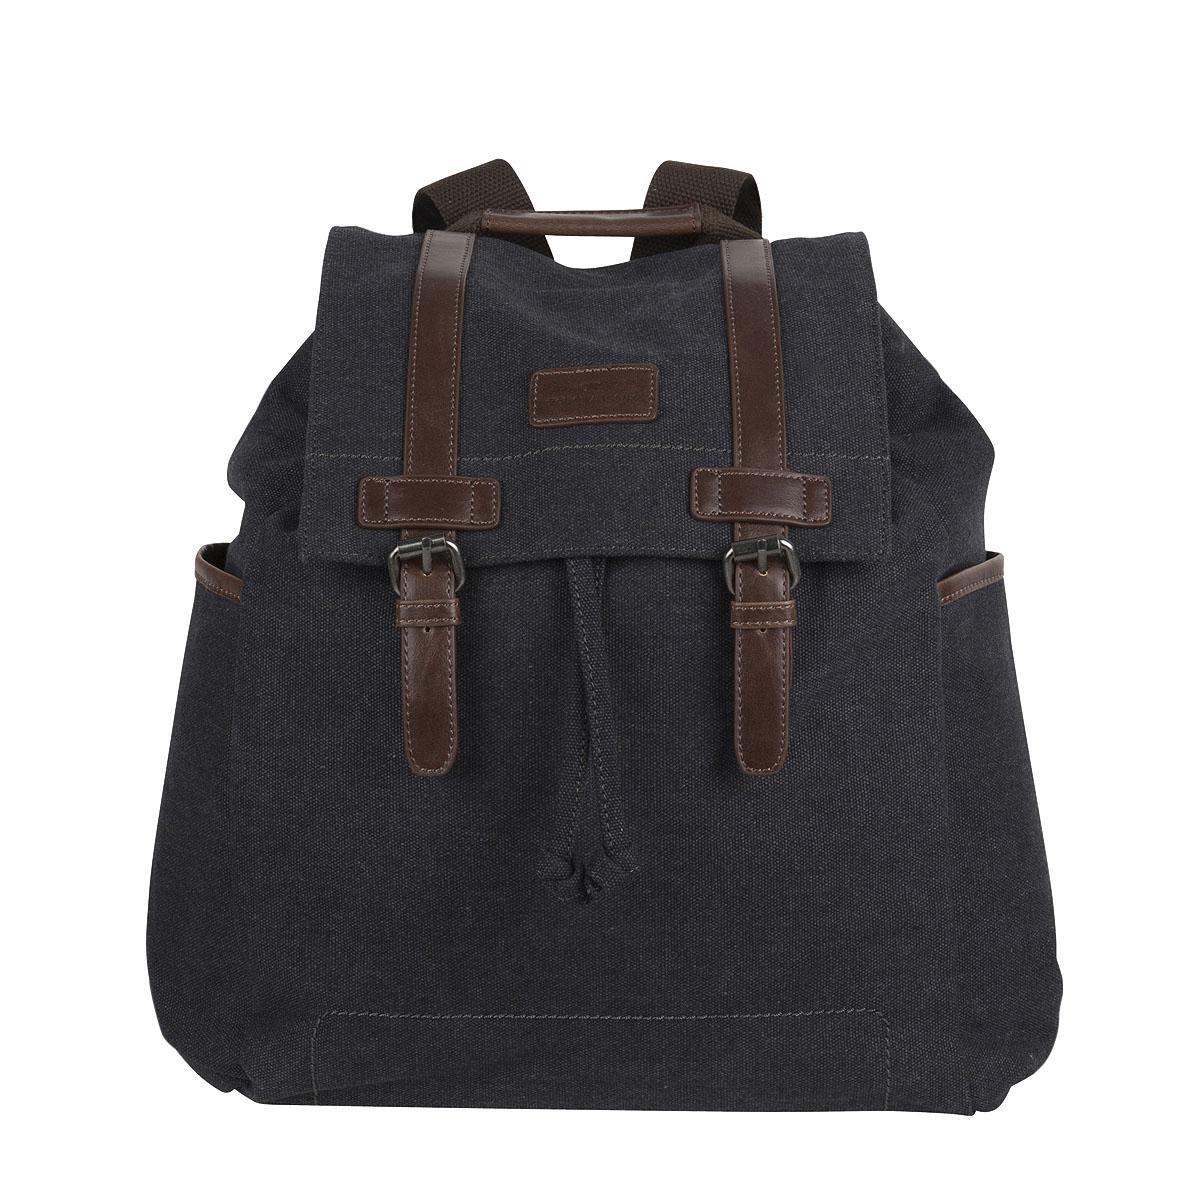 Tom Tailor Canvas Backpack City Rucksack Daypack 19053